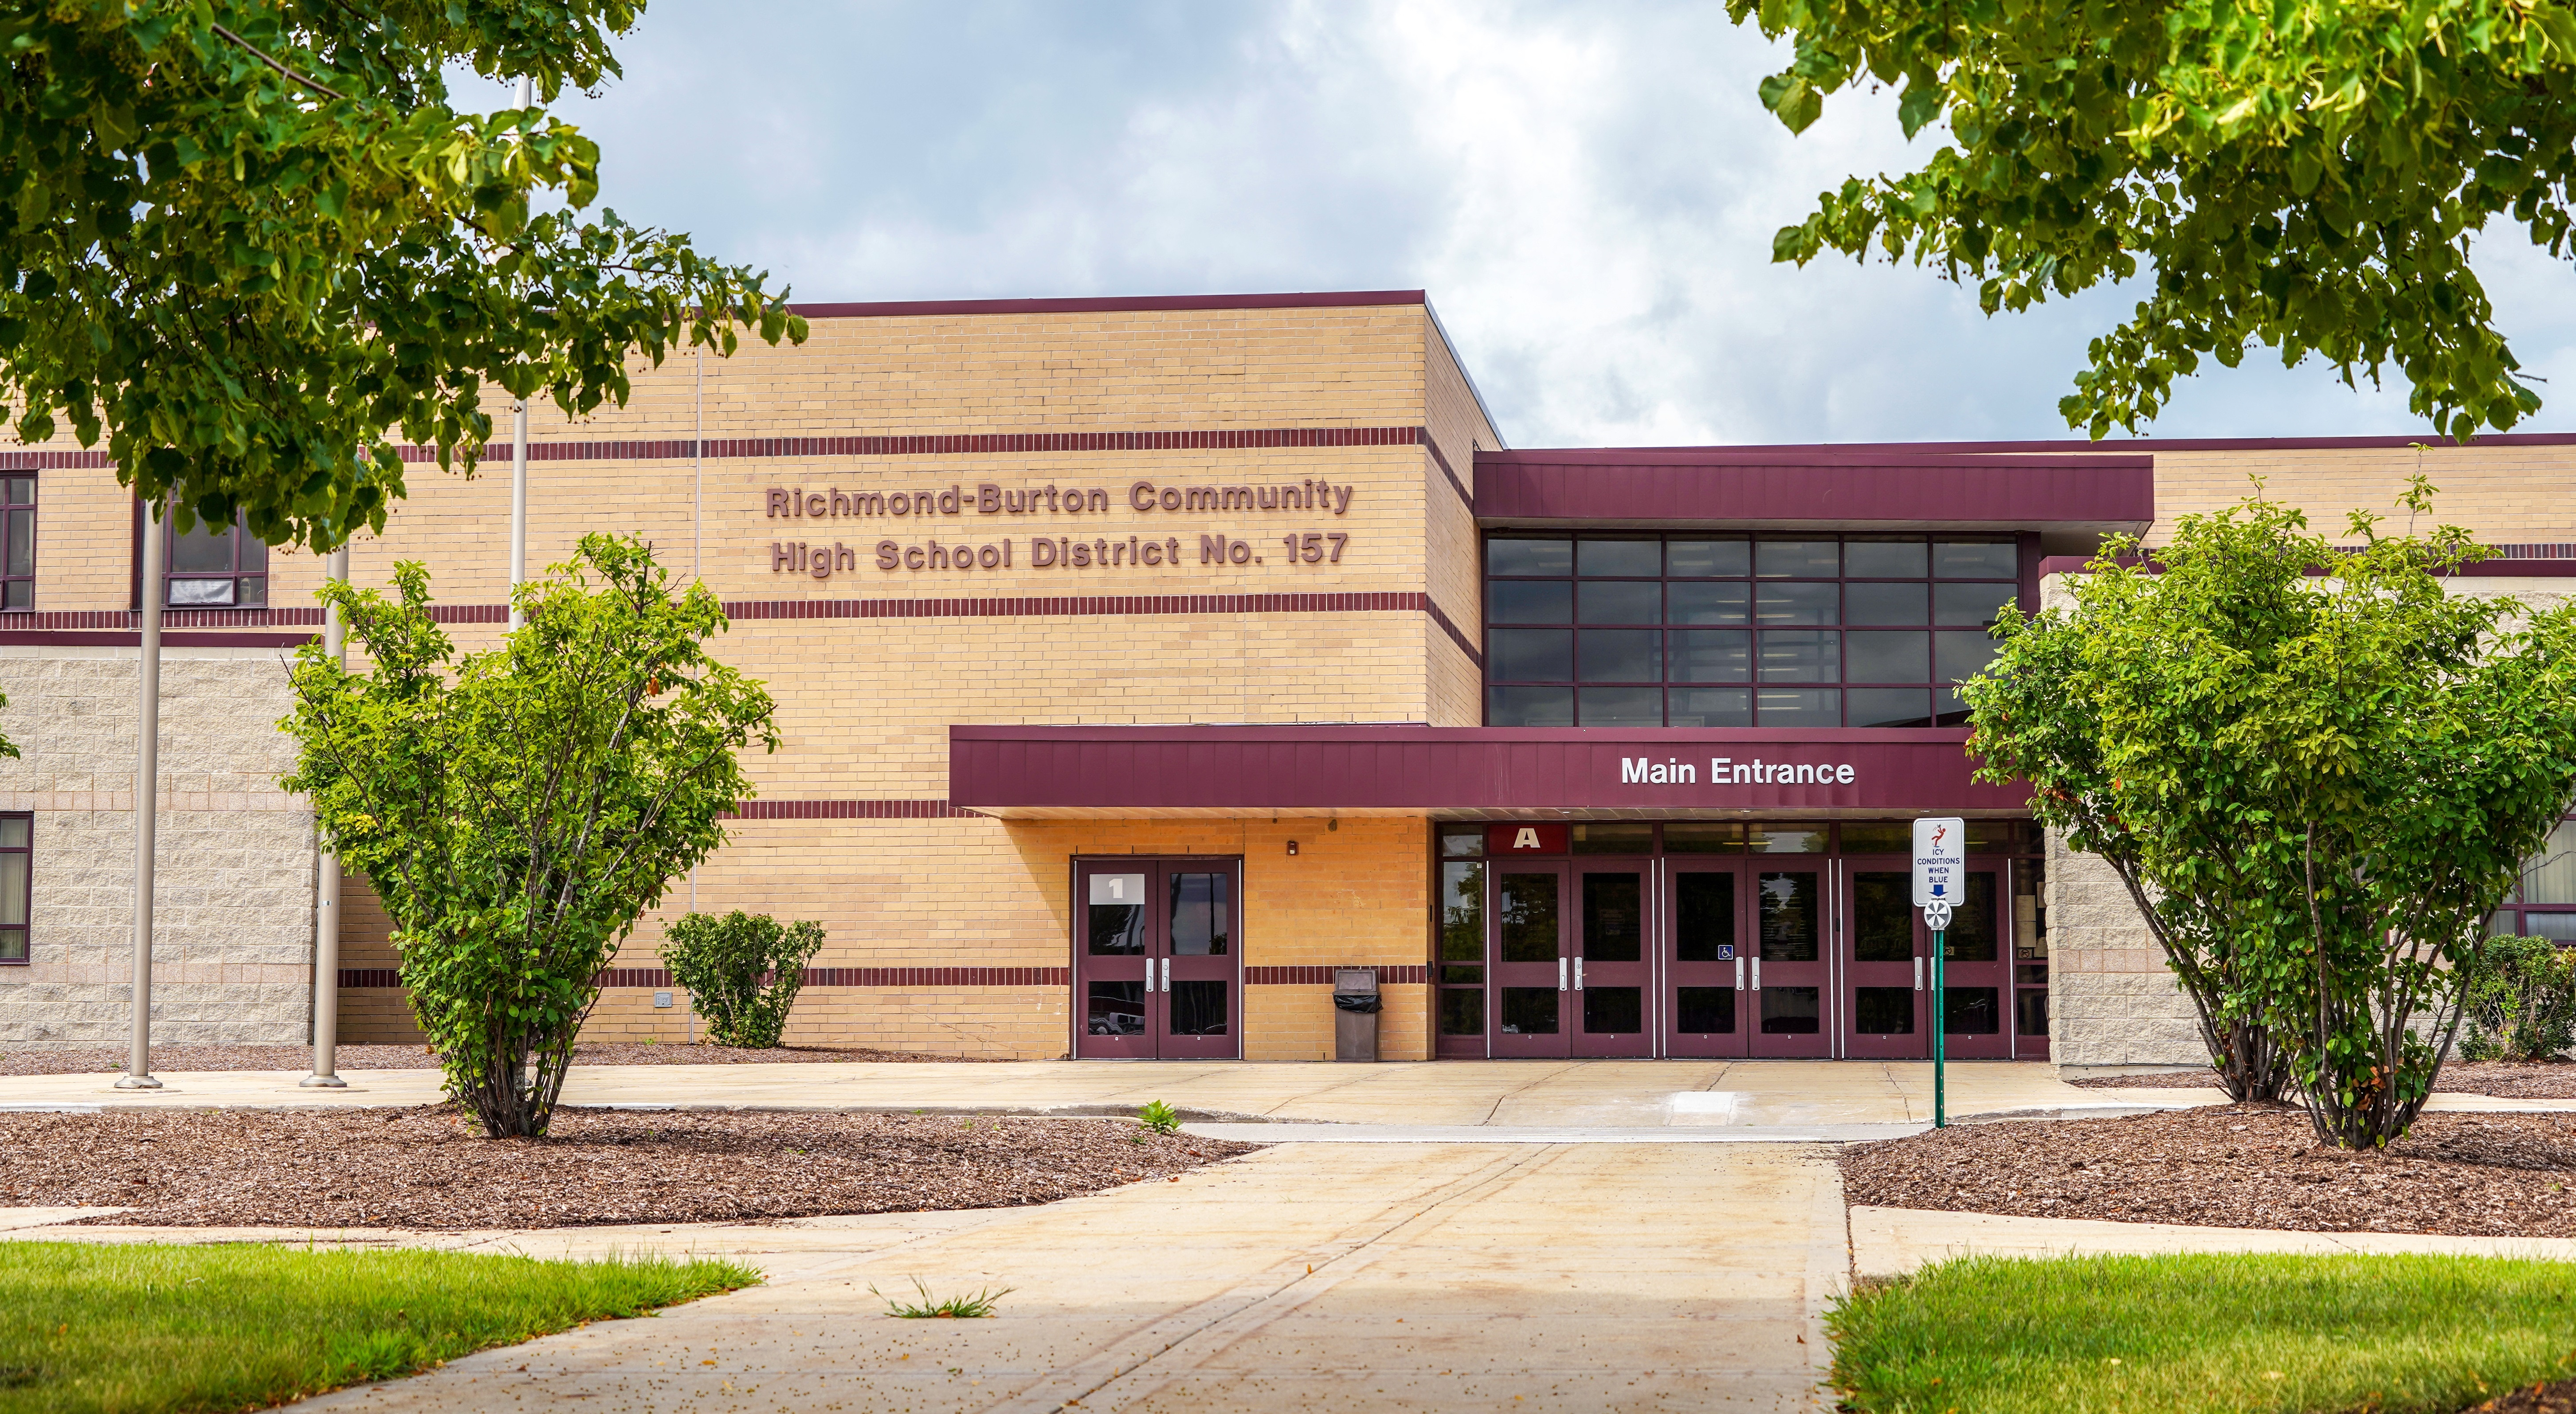 Richmond-Burton High School